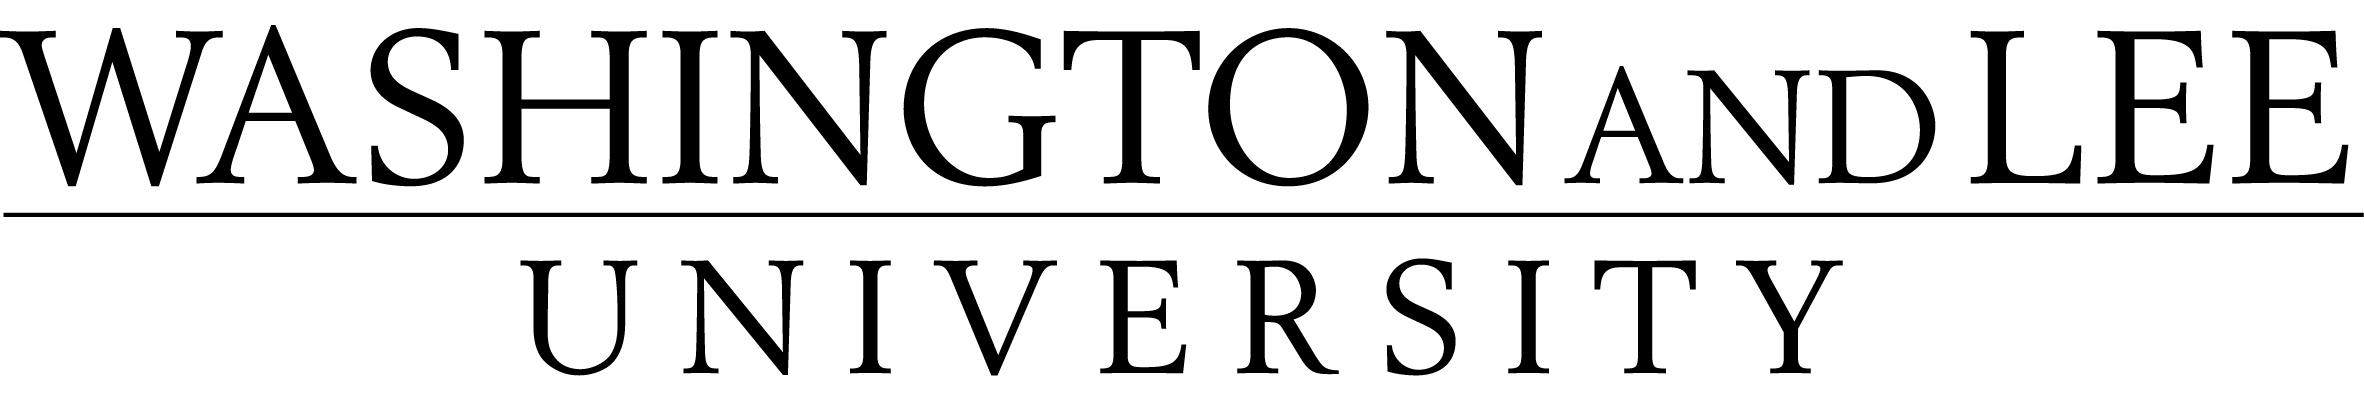 downloadable graphic elements   washington and lee university